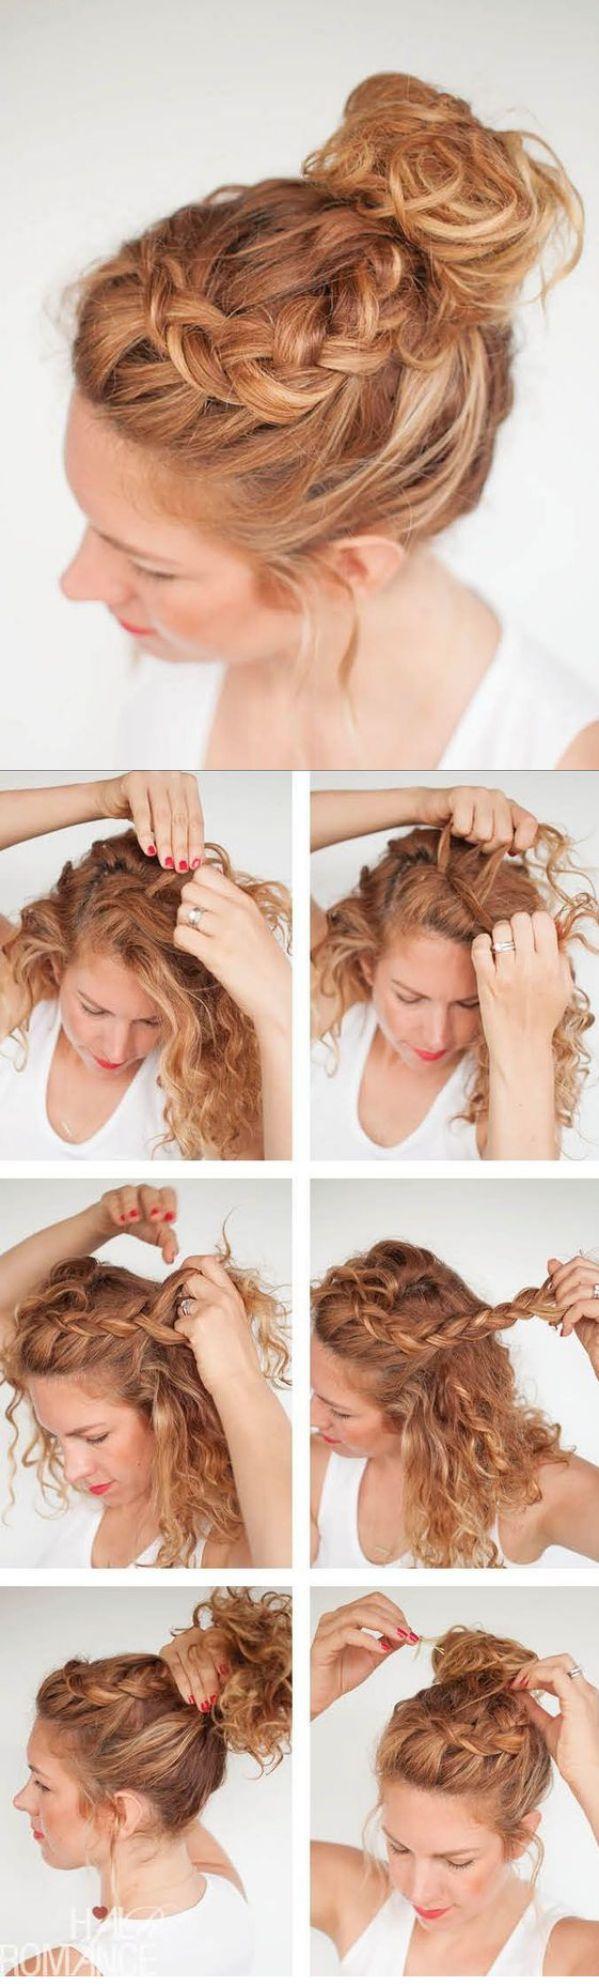 hermosos peinados pelo rizado para todos los das - Recogido Rizado